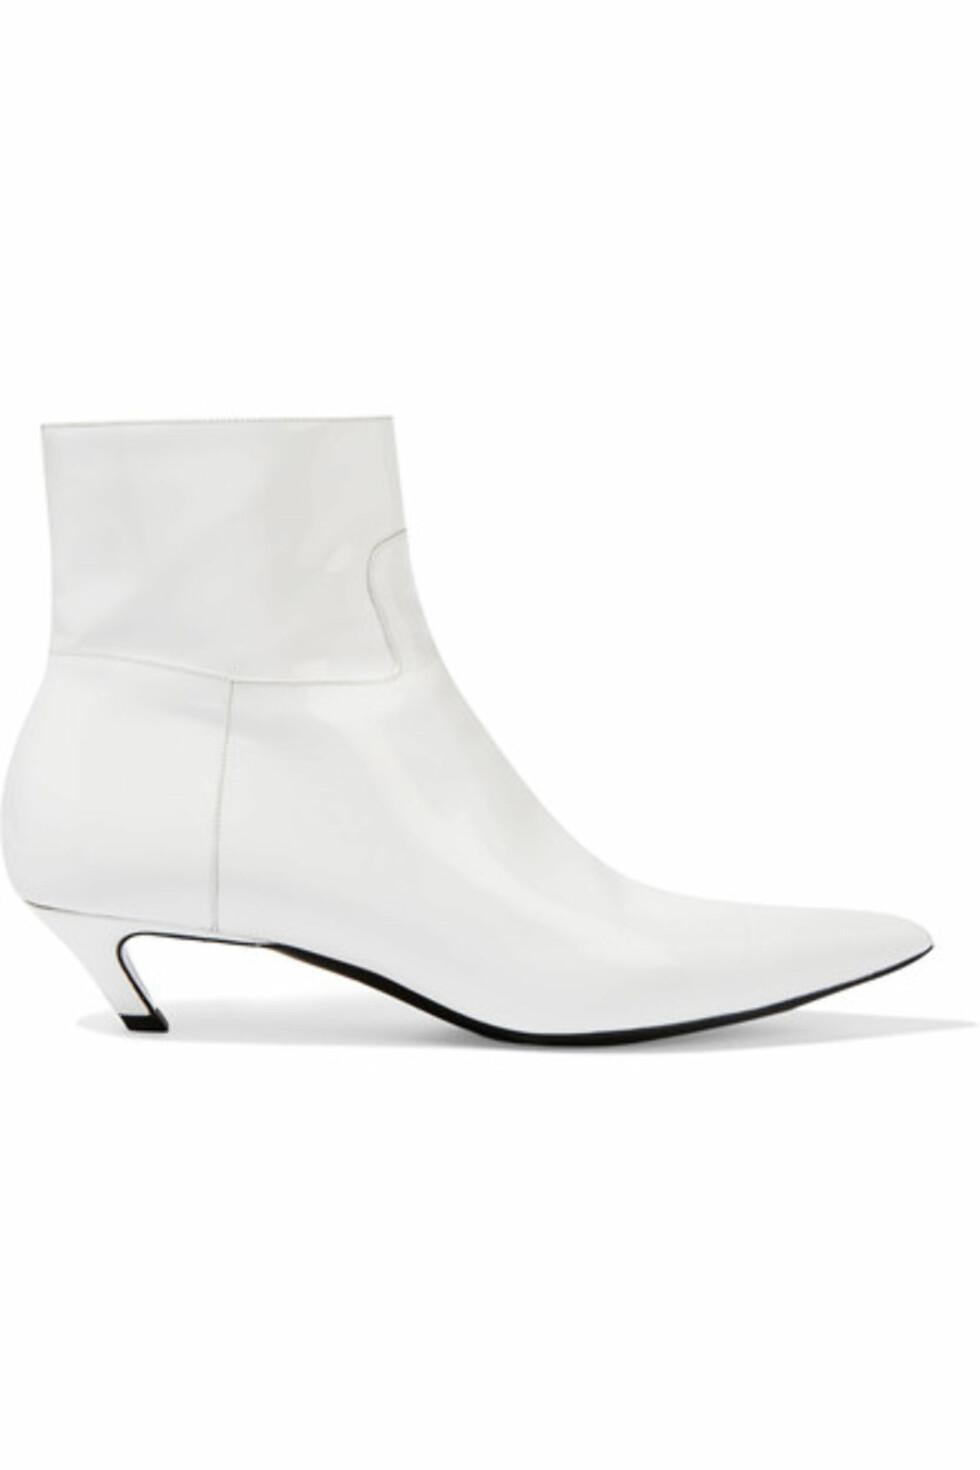 Boots fra Balenciaga via Net-a-porter.com | ca. kr 6500 | https://www.net-a-porter.com/no/en/product/768402/Balenciaga/patent-leather-ankle-boots